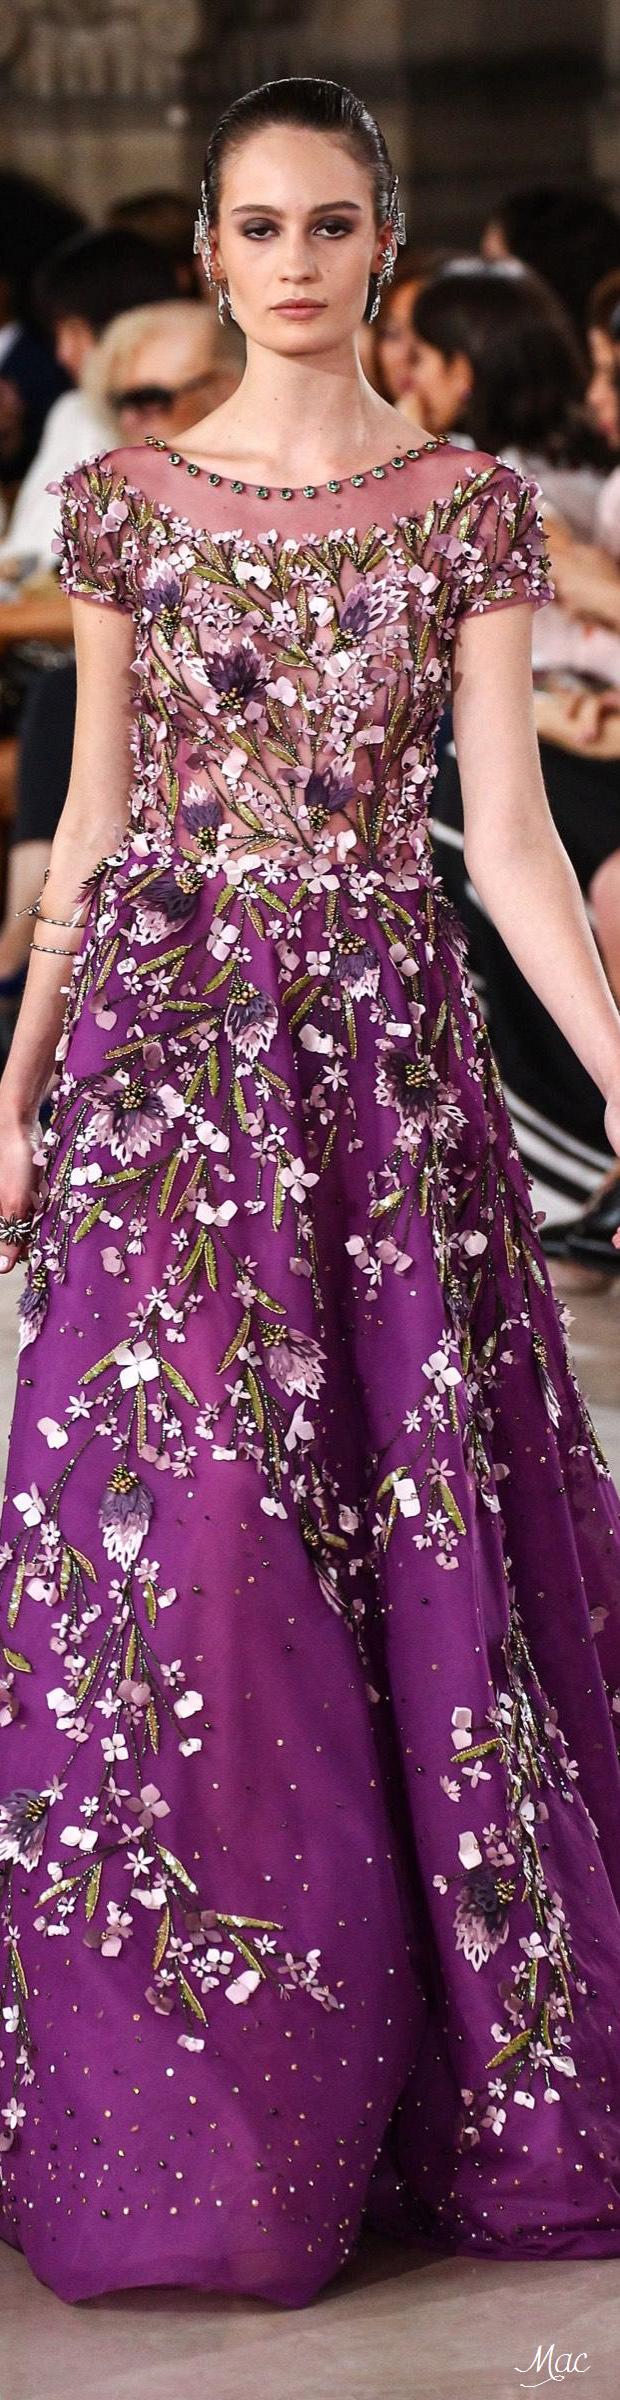 Fall 2016 Haute Couture - Georges Hobeika | Estilo | Pinterest ...